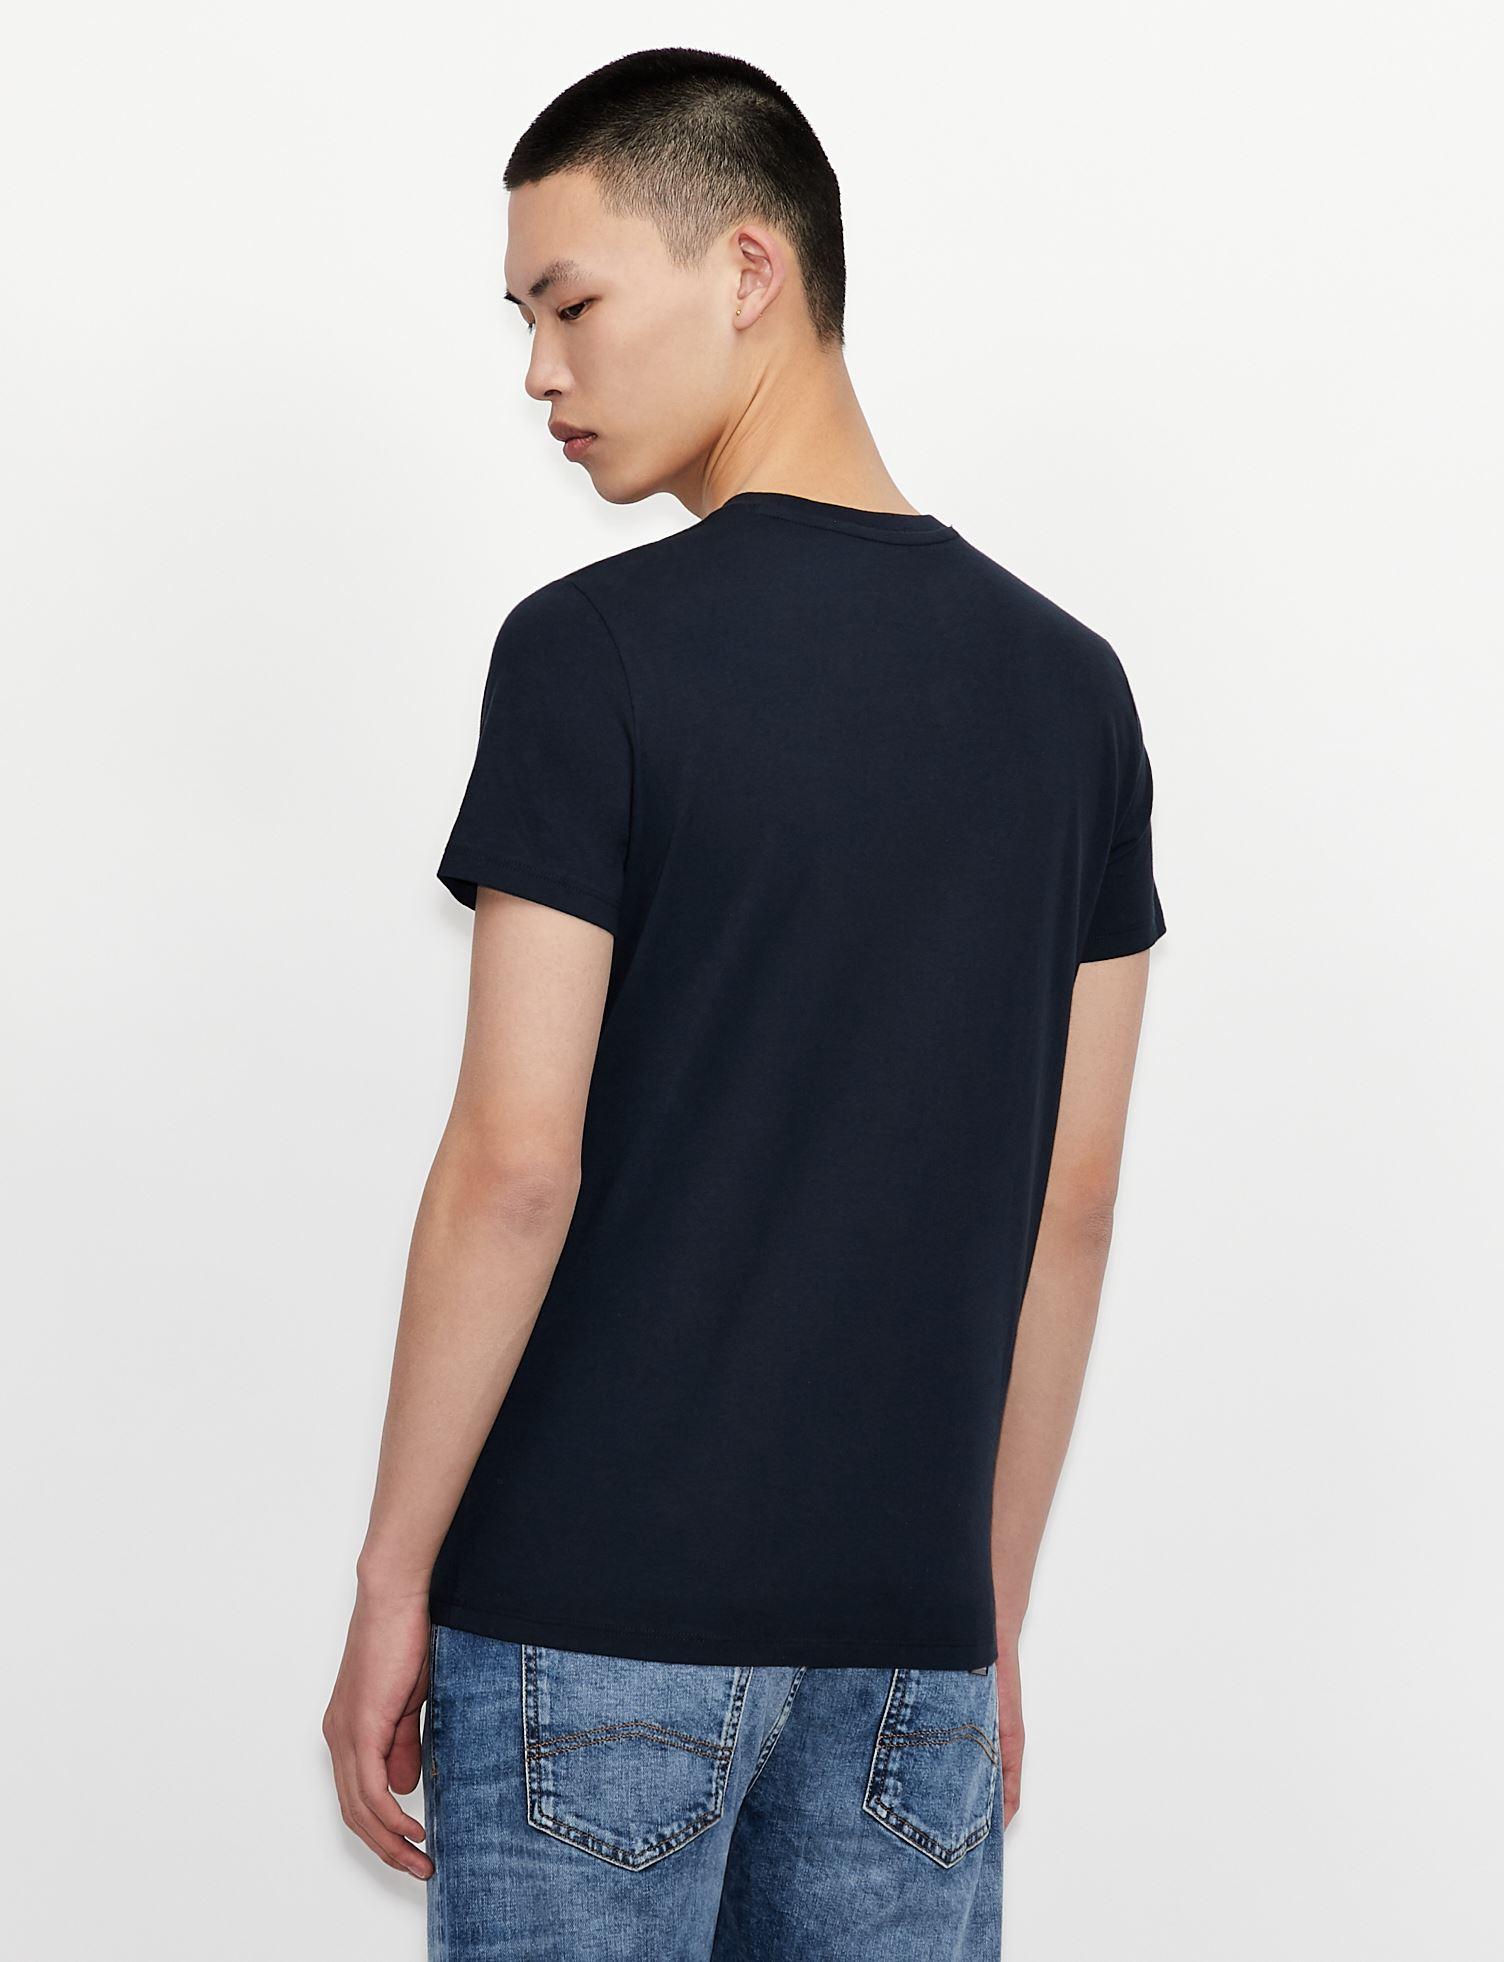 T-shirt Armani Exchange ARMANI EXCHANGE | T-shirt | 3KZTAG-ZJ4KZ1510